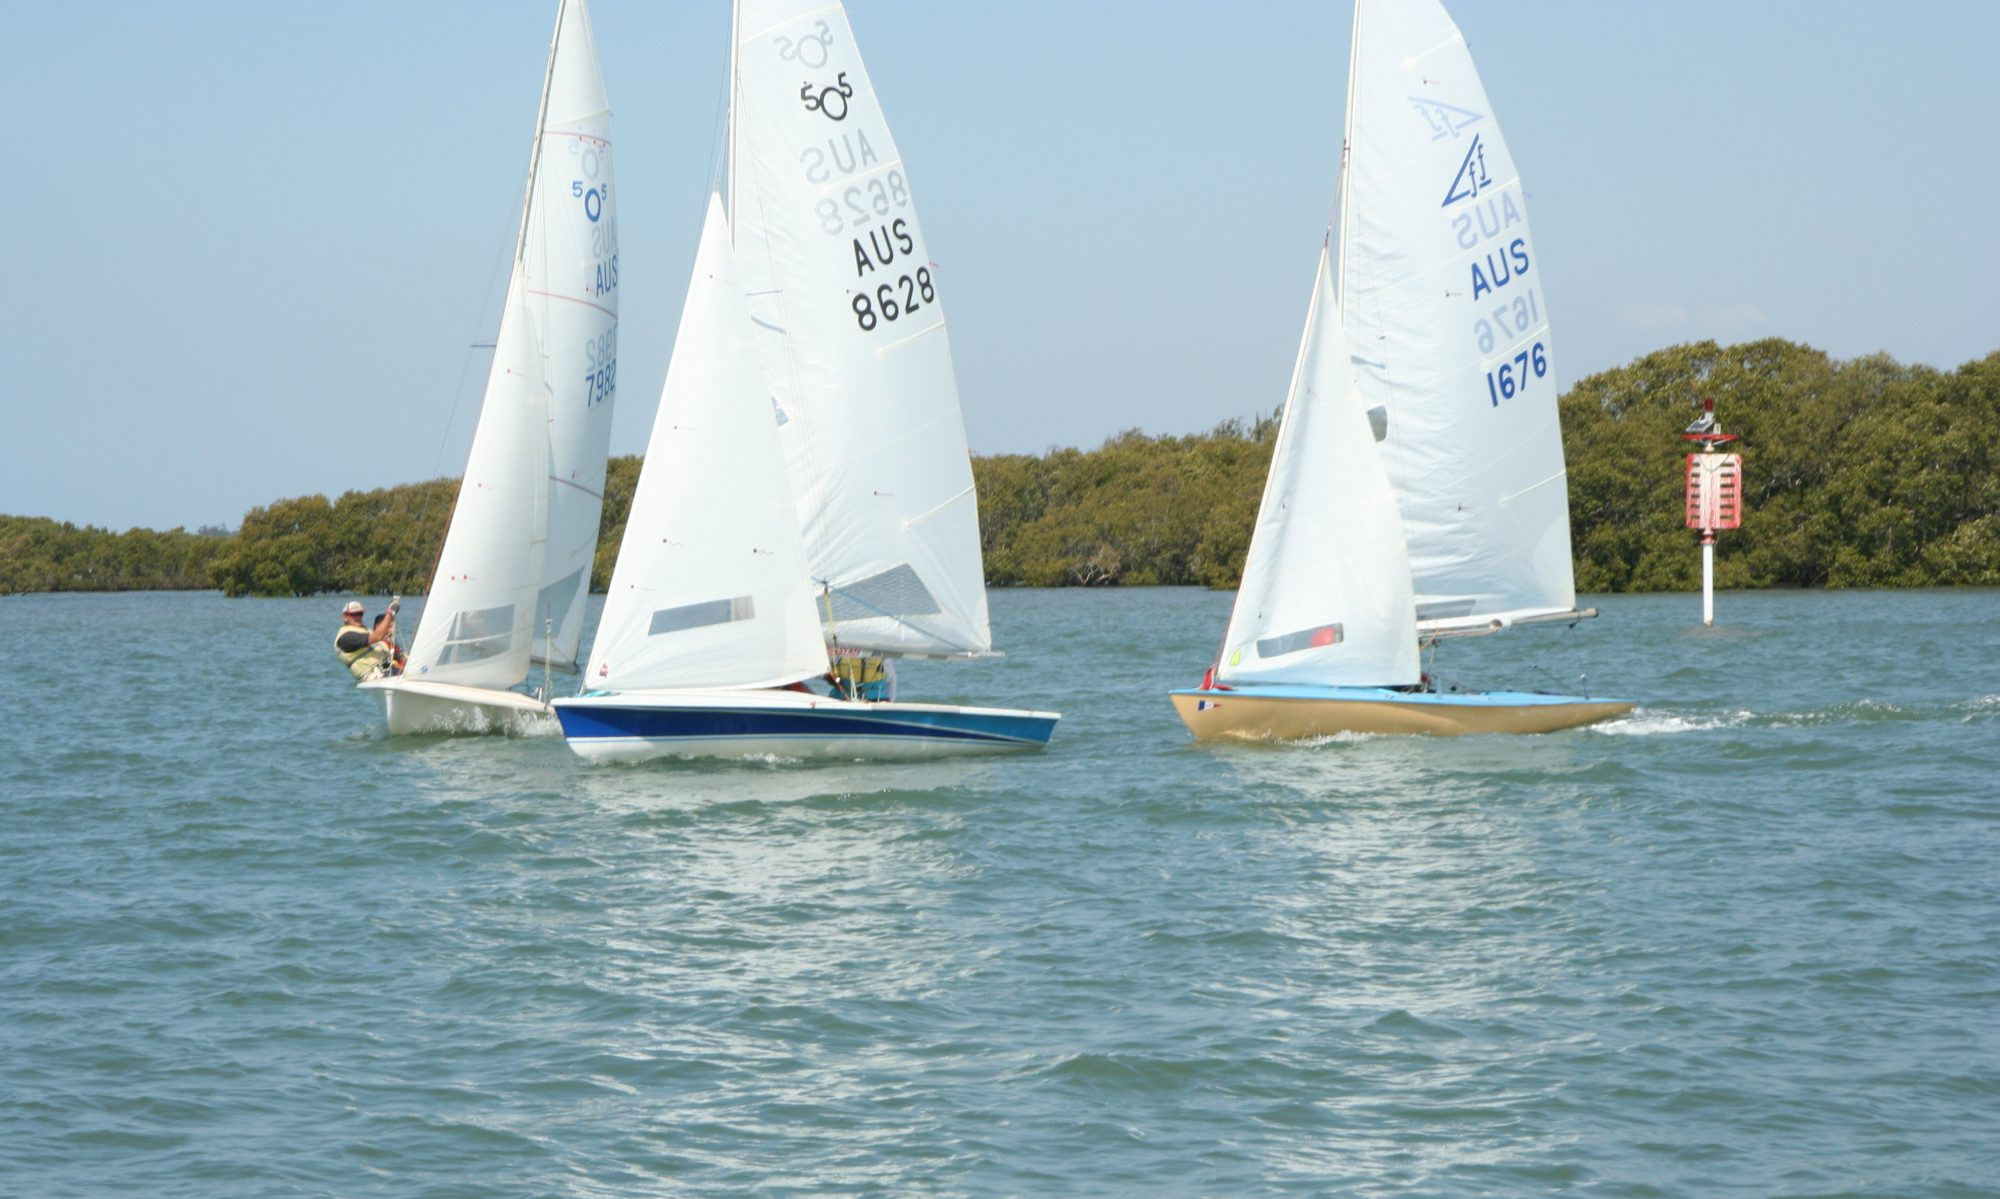 Sandgate Yacht Club